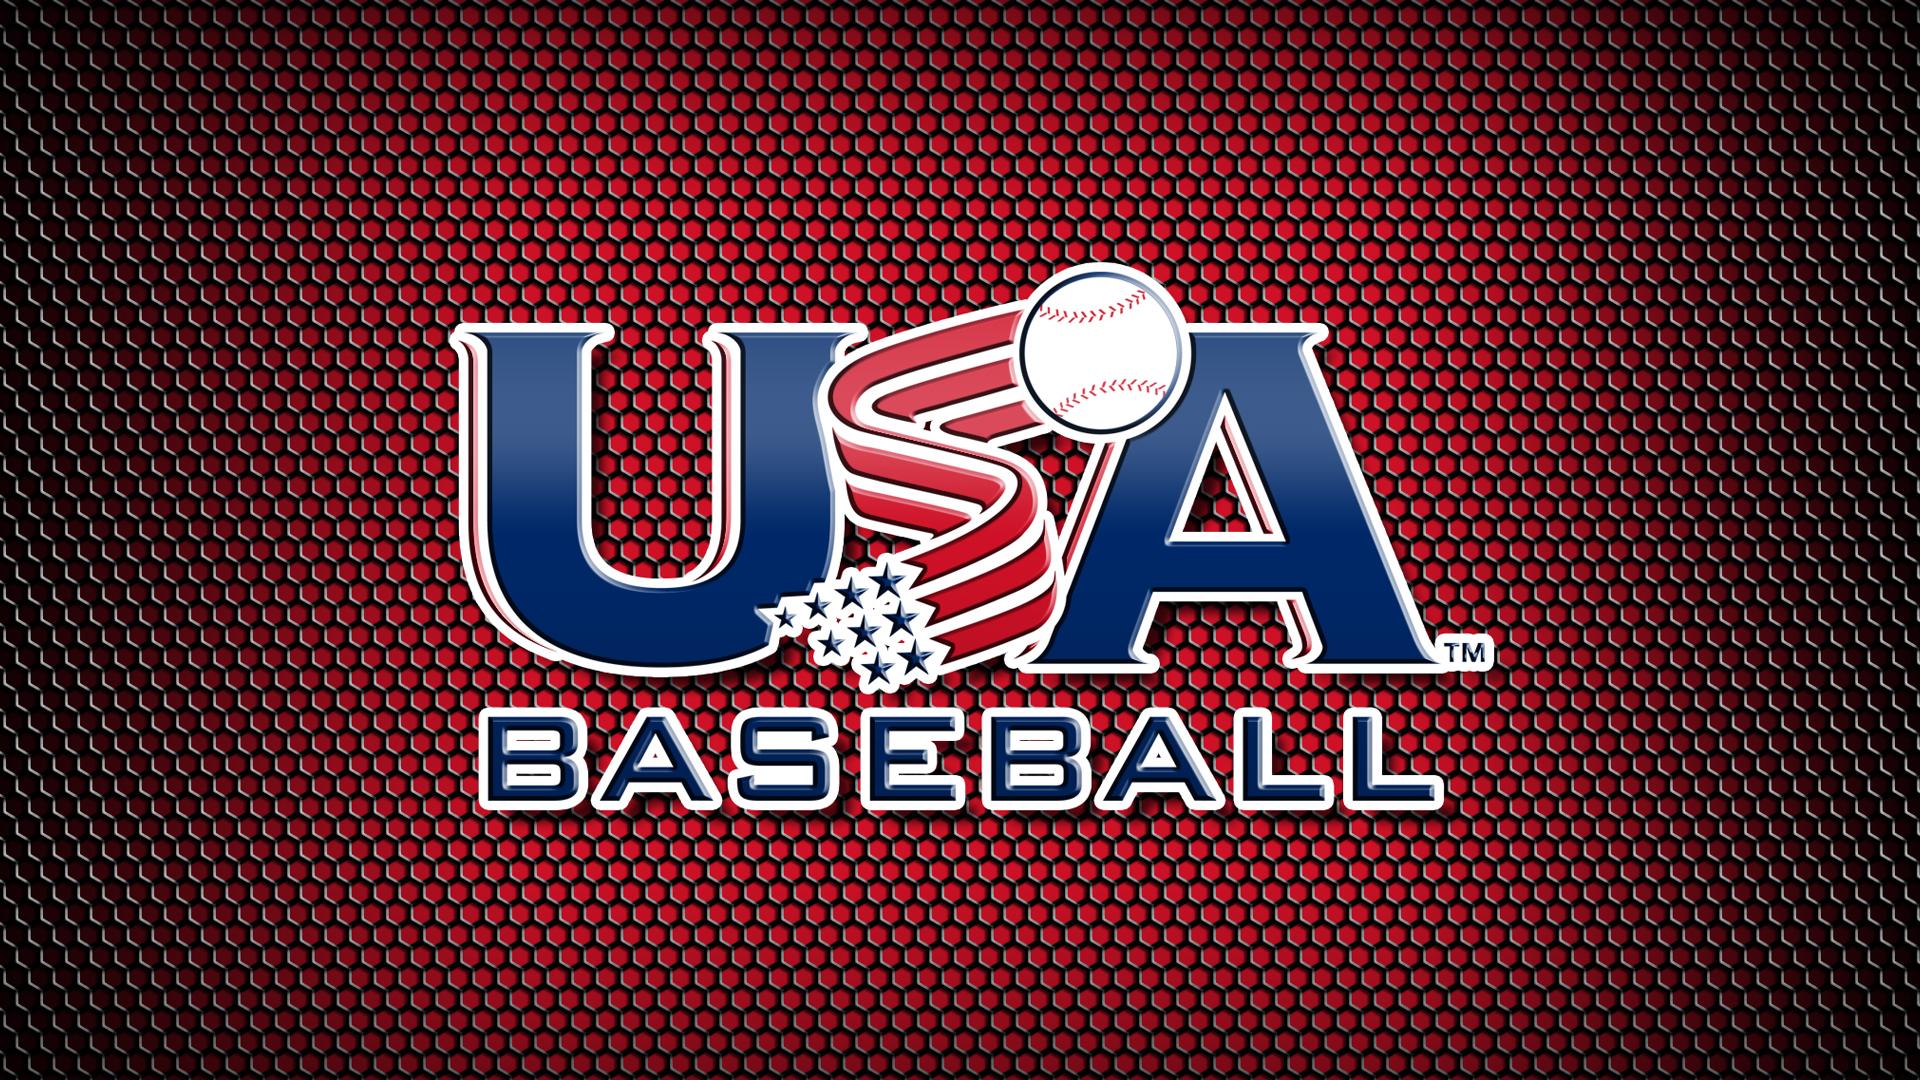 wallpaper baseball usa wallpapers 1920x1080 1920x1080